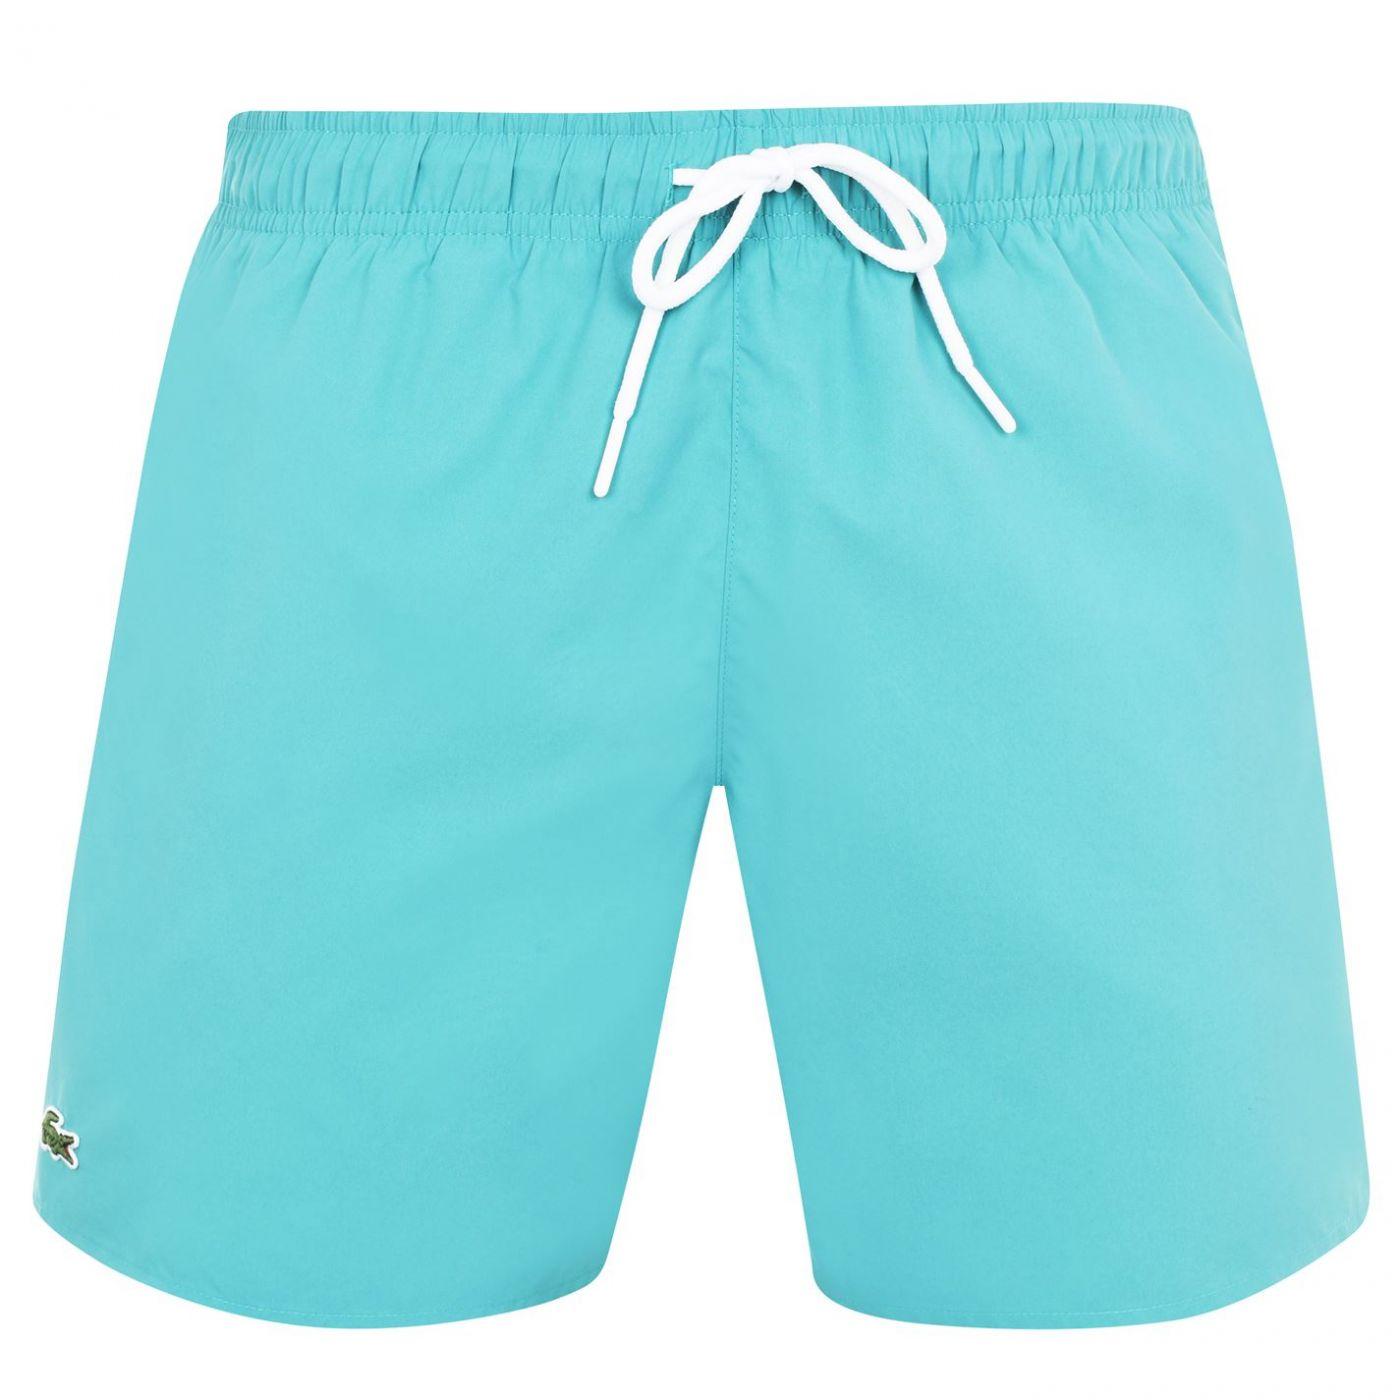 Lacoste Taffeta Swim Shorts